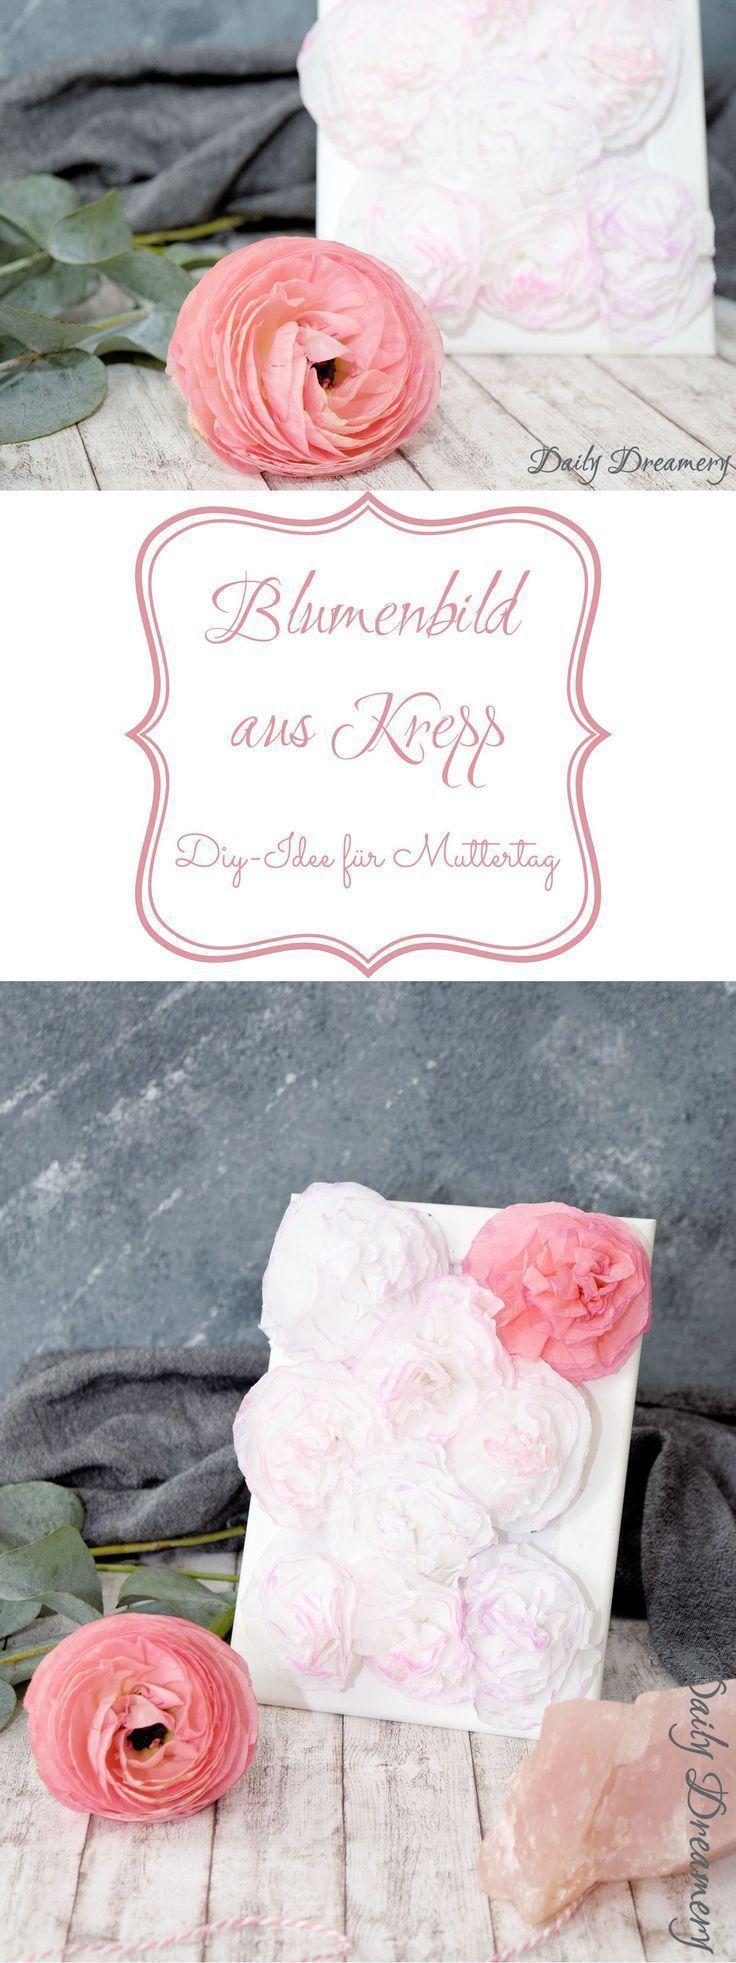 DIY-Blumenbild mit Blüten aus Krepp-Papier tolles Muttertags-Geschenk DIY-Blume… – SELBERMACHEN